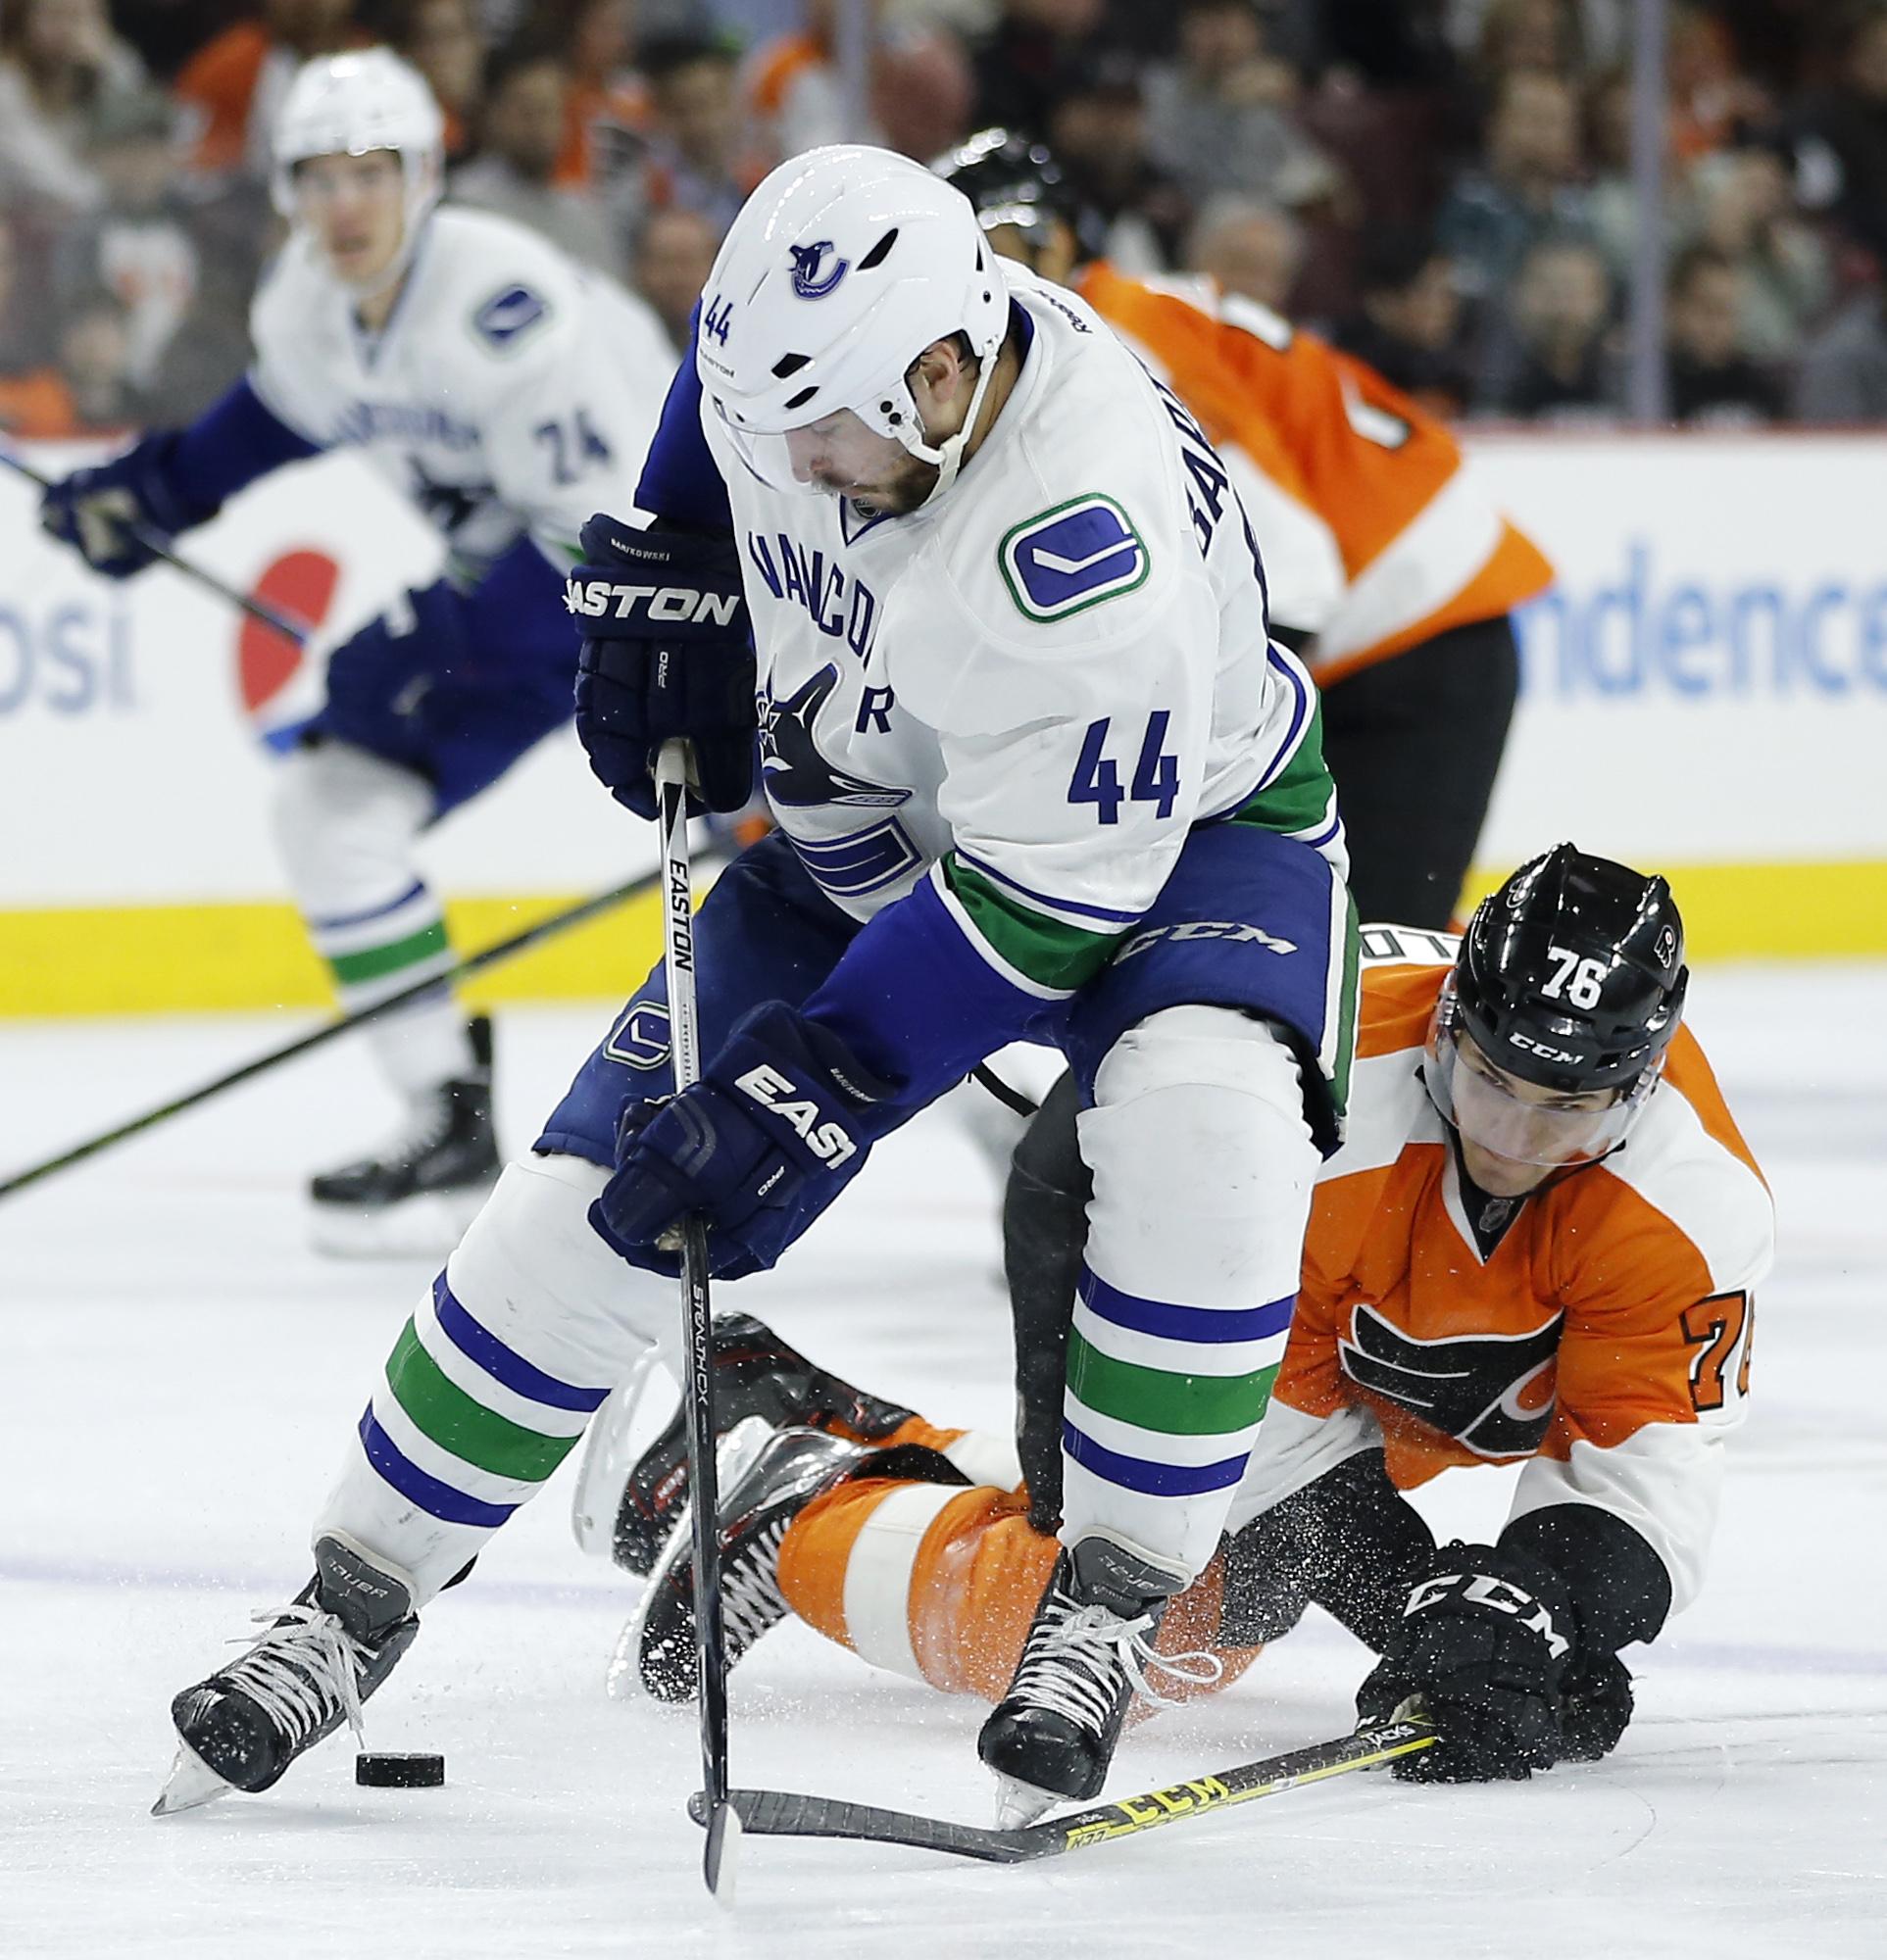 Philadelphia Flyers' Chris VandeVelde (76) knocks the pucks away from Vancouver Canucks' Matt Bartkowski (44) during the third period of an NHL hockey game, Thursday, Dec. 17, 2015, in Philadelphia. Philadelphia won 2-0. (AP Photo/Matt Slocum)